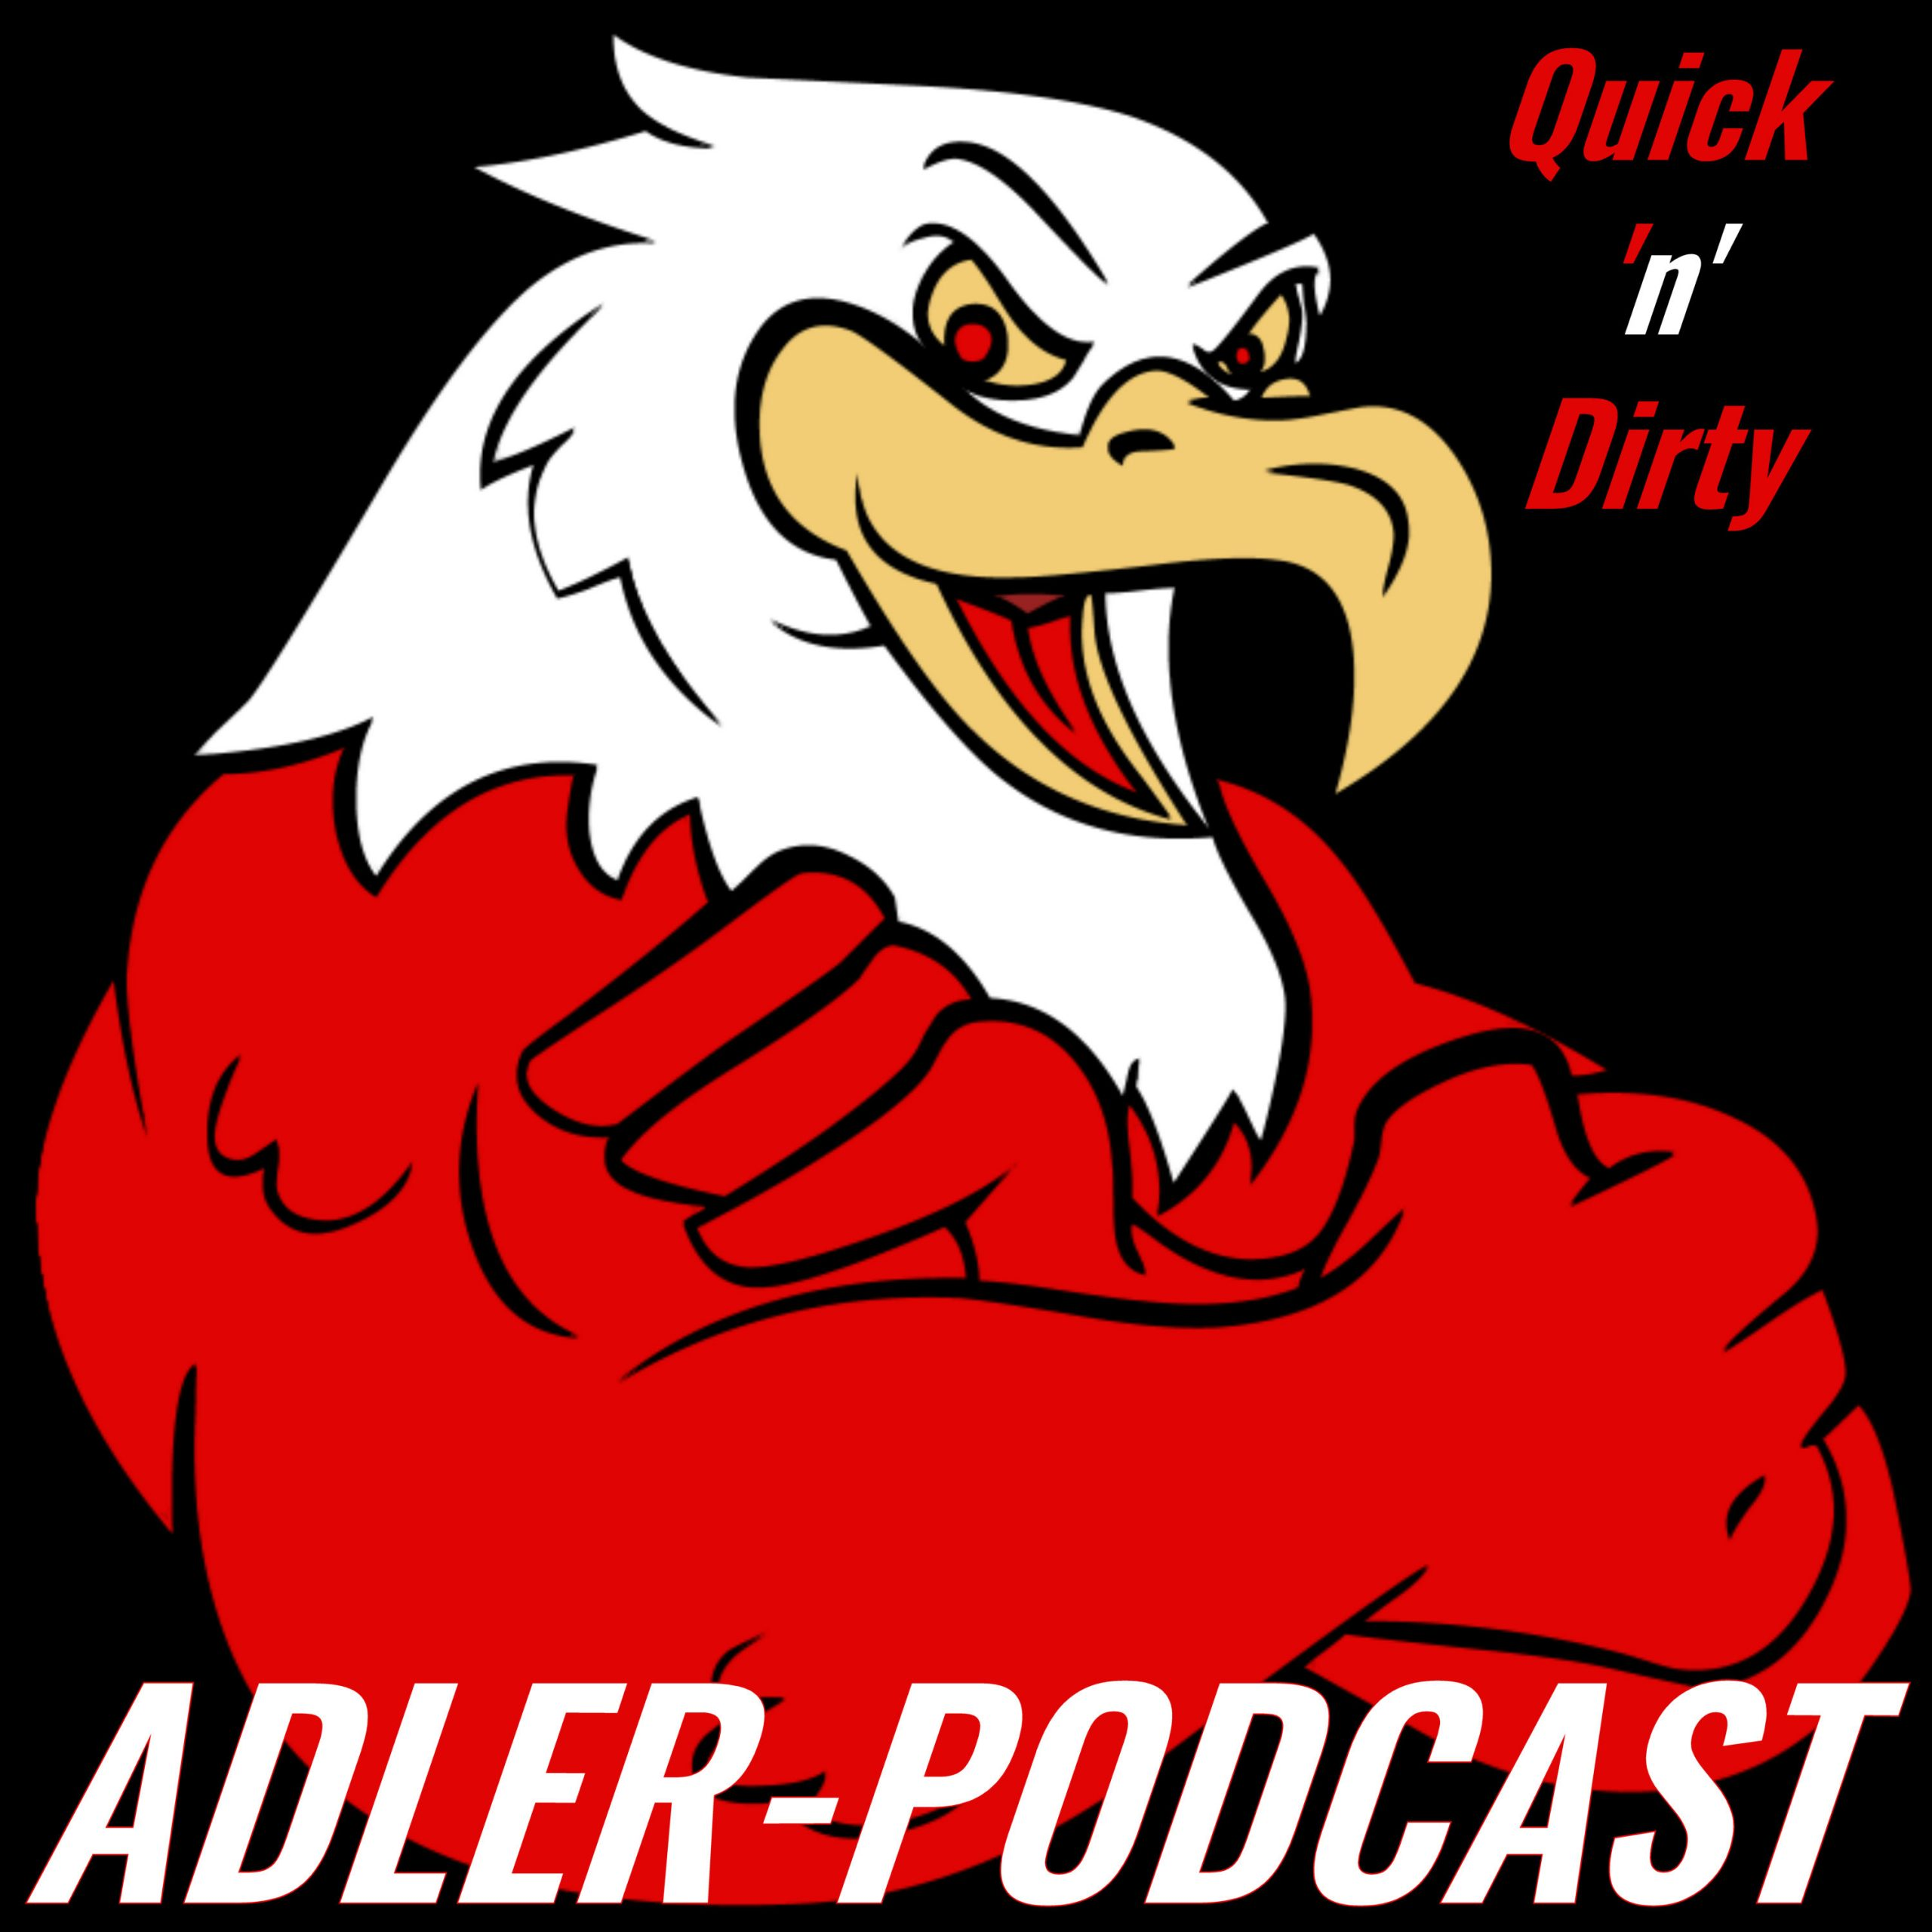 Adler-Podcast Quick & Dirty: Nach fcb - SGE